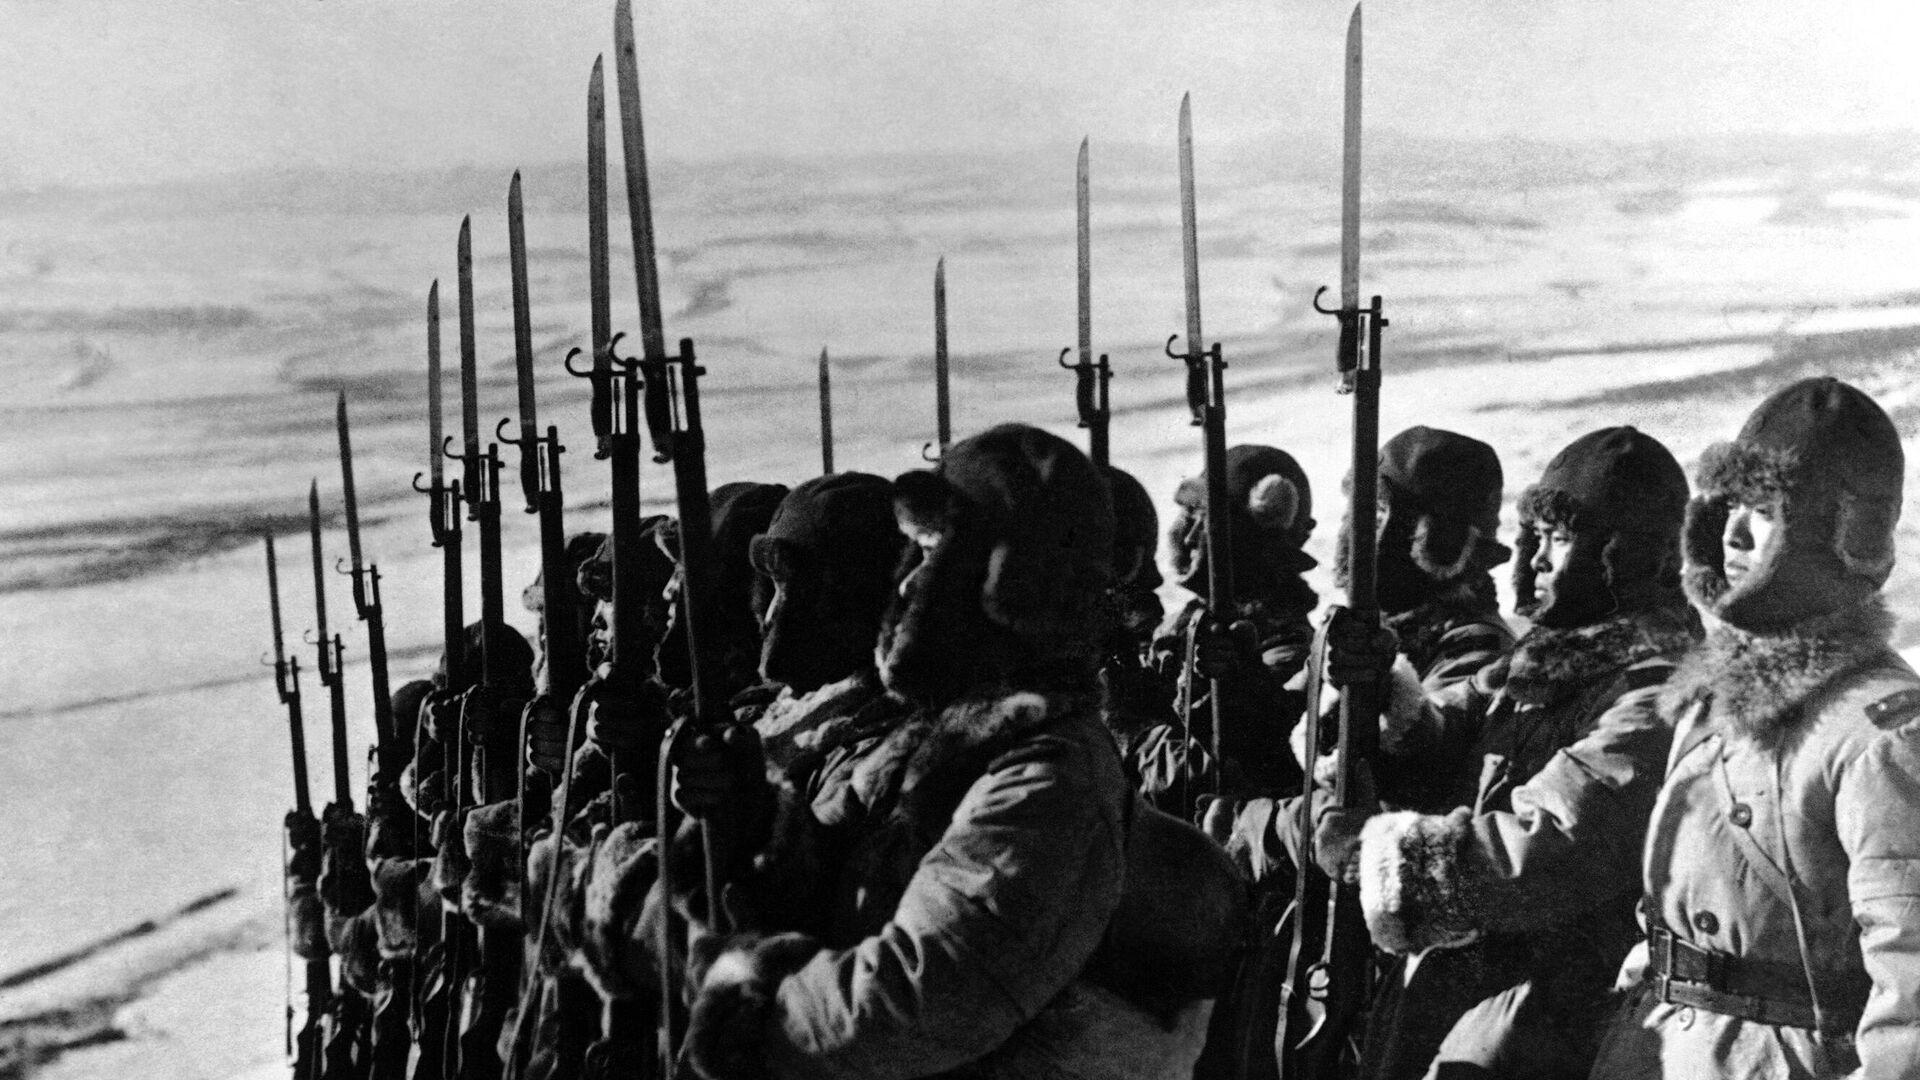 Soldados japoneses cerca de la frontera de la URSS, en Siberia - Sputnik Mundo, 1920, 09.08.2021